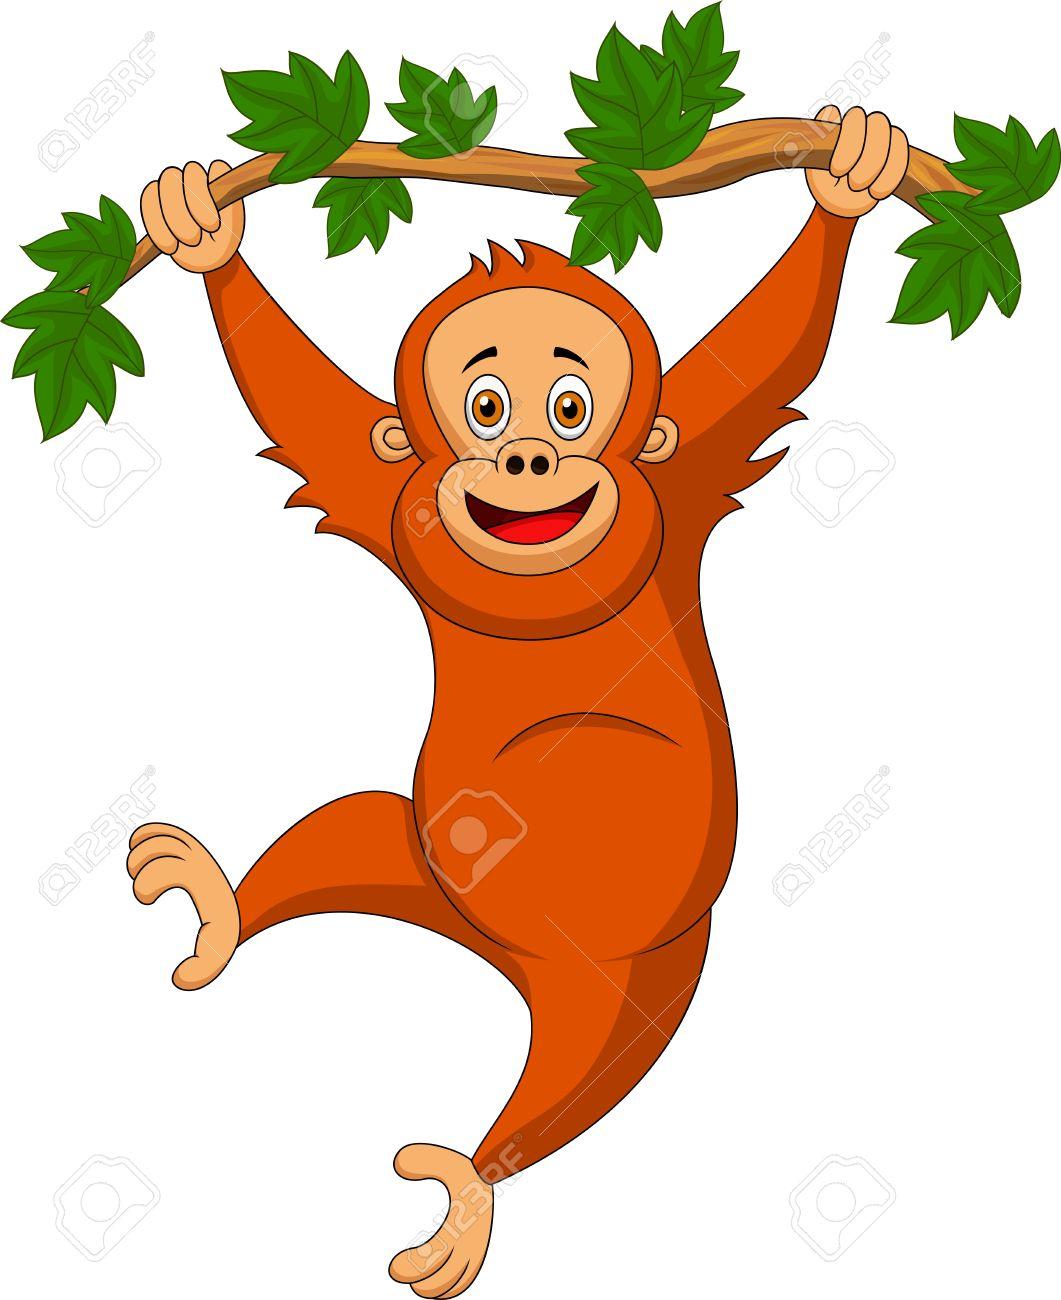 2 846 orangutan stock illustrations cliparts and royalty free rh 123rf com clipart orangutan hanging orange orangutan clipart